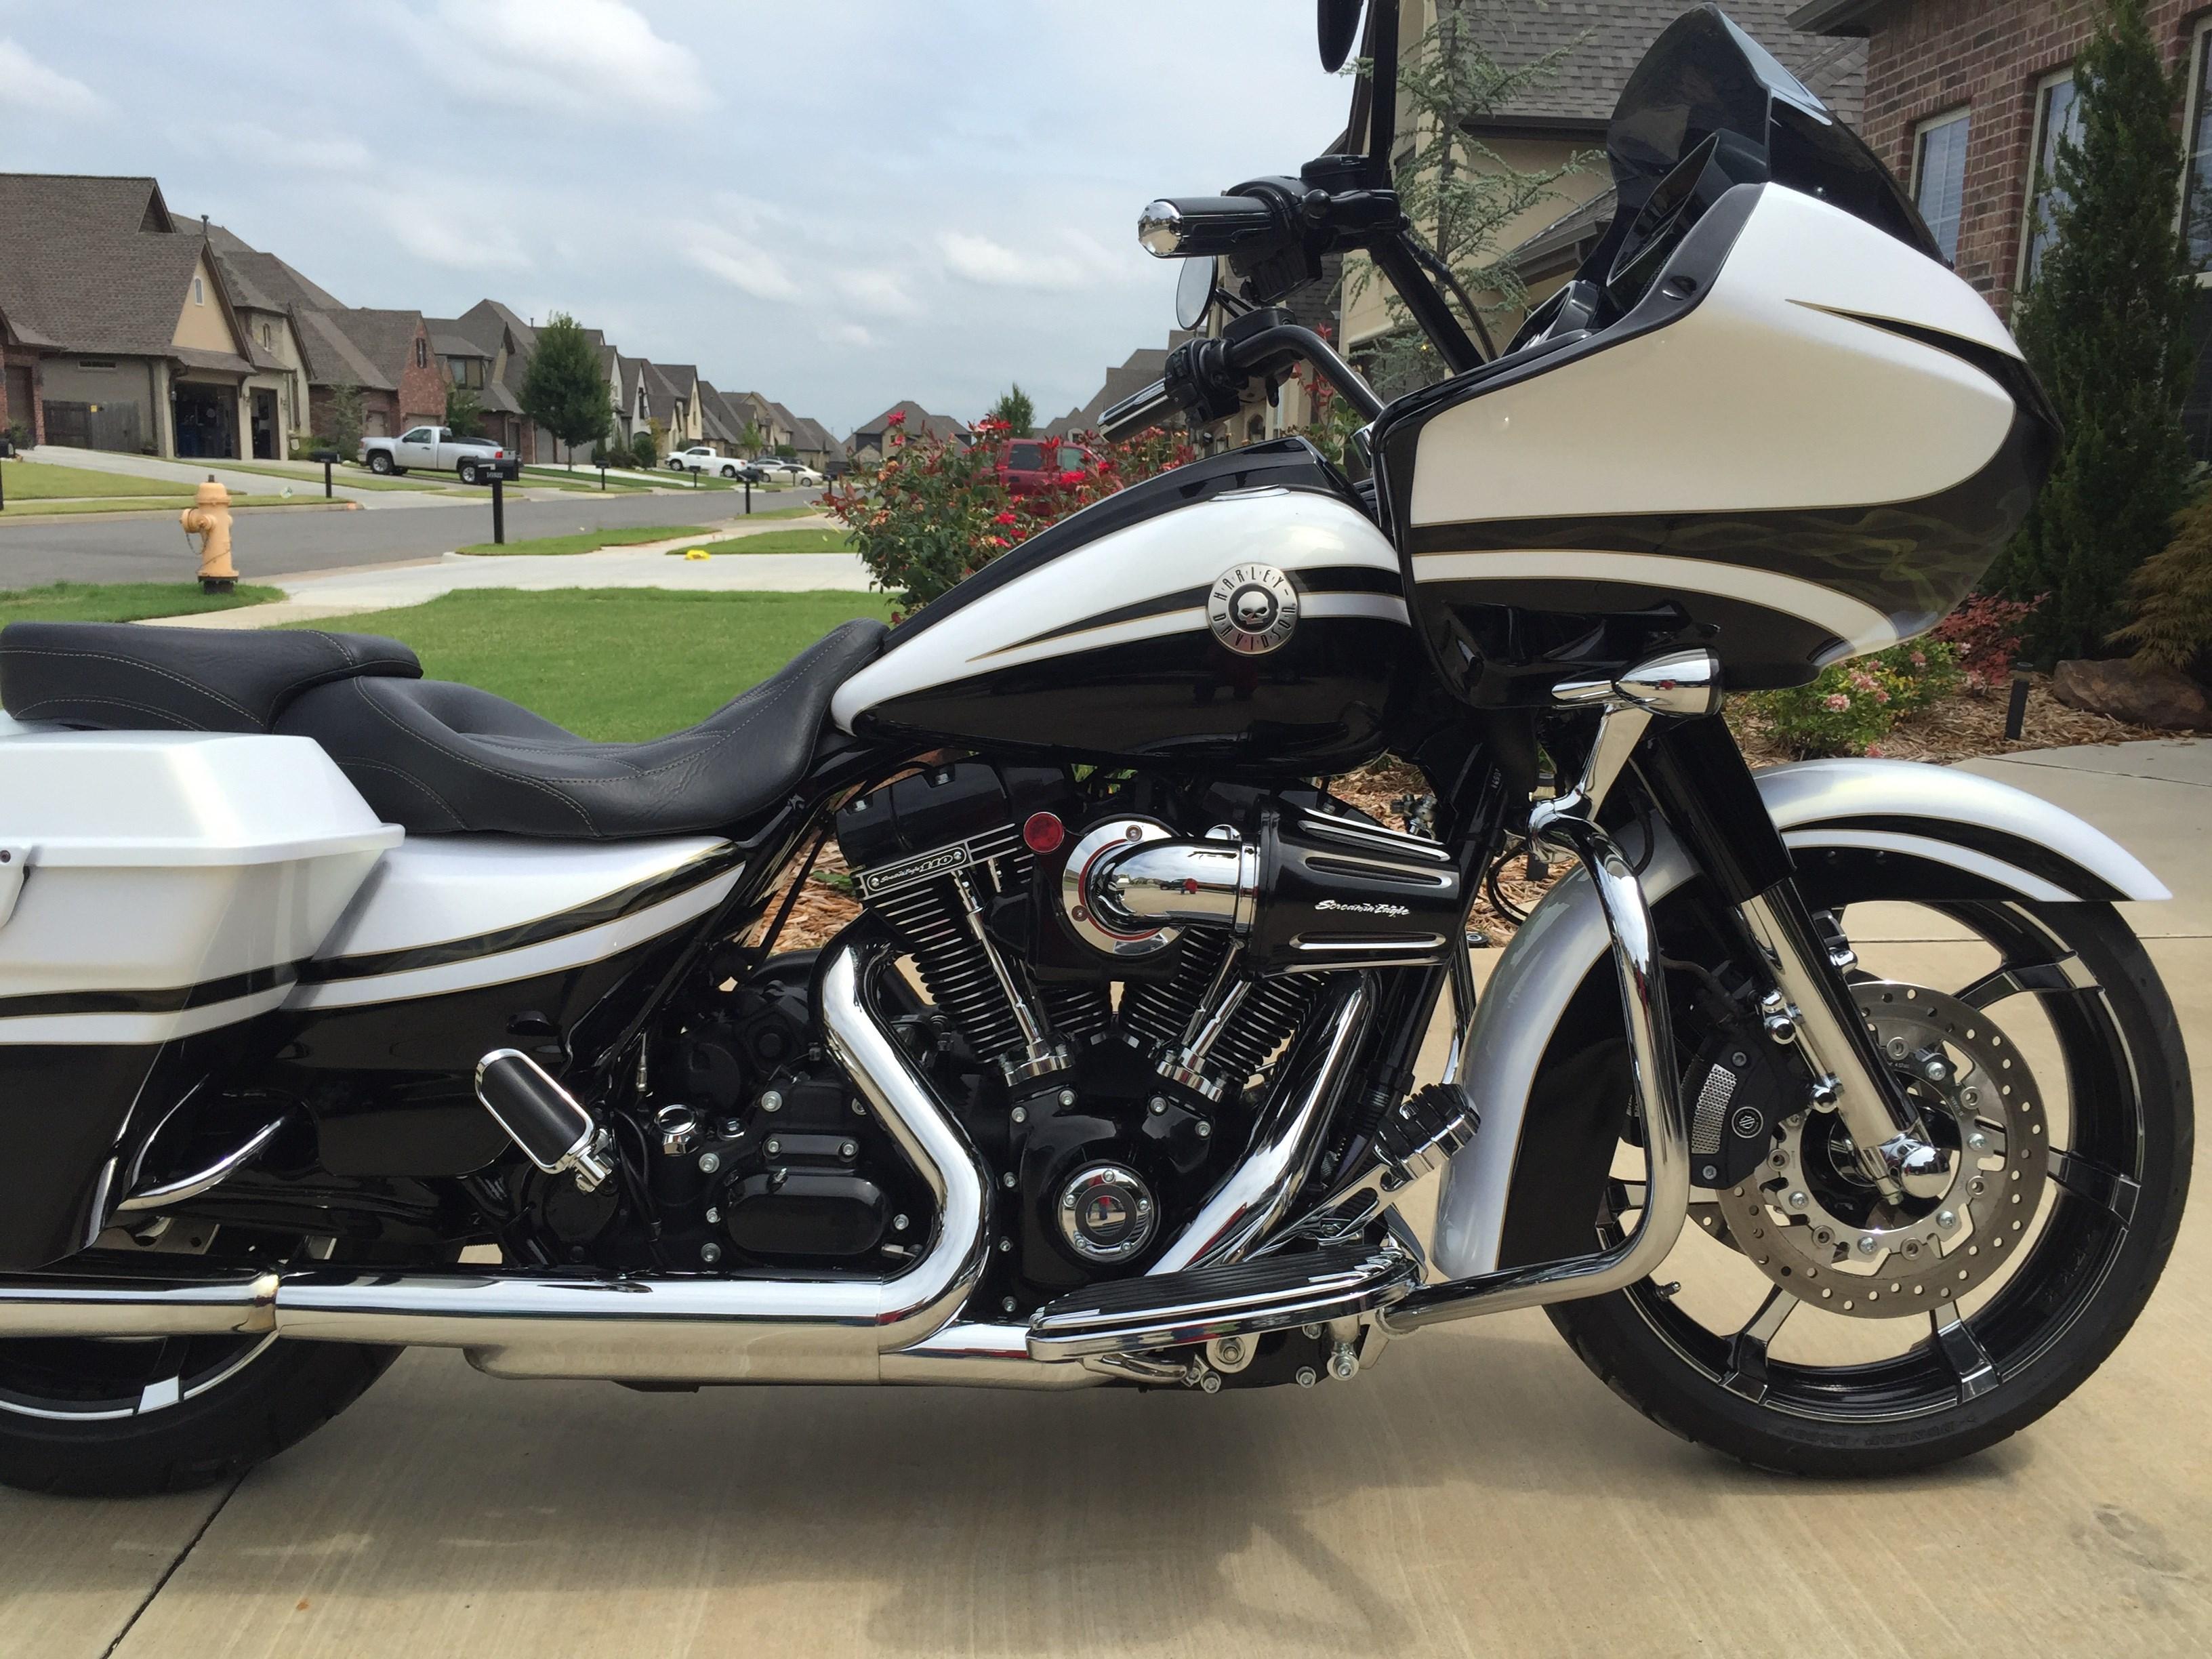 Harley Cvo Motorcycles For Sale Woodstock Ga >> 2012 Harley-Davidson® FLTRXSE CVO™ Road Glide® Custom (Black/White), Tulsa, Oklahoma (593050 ...